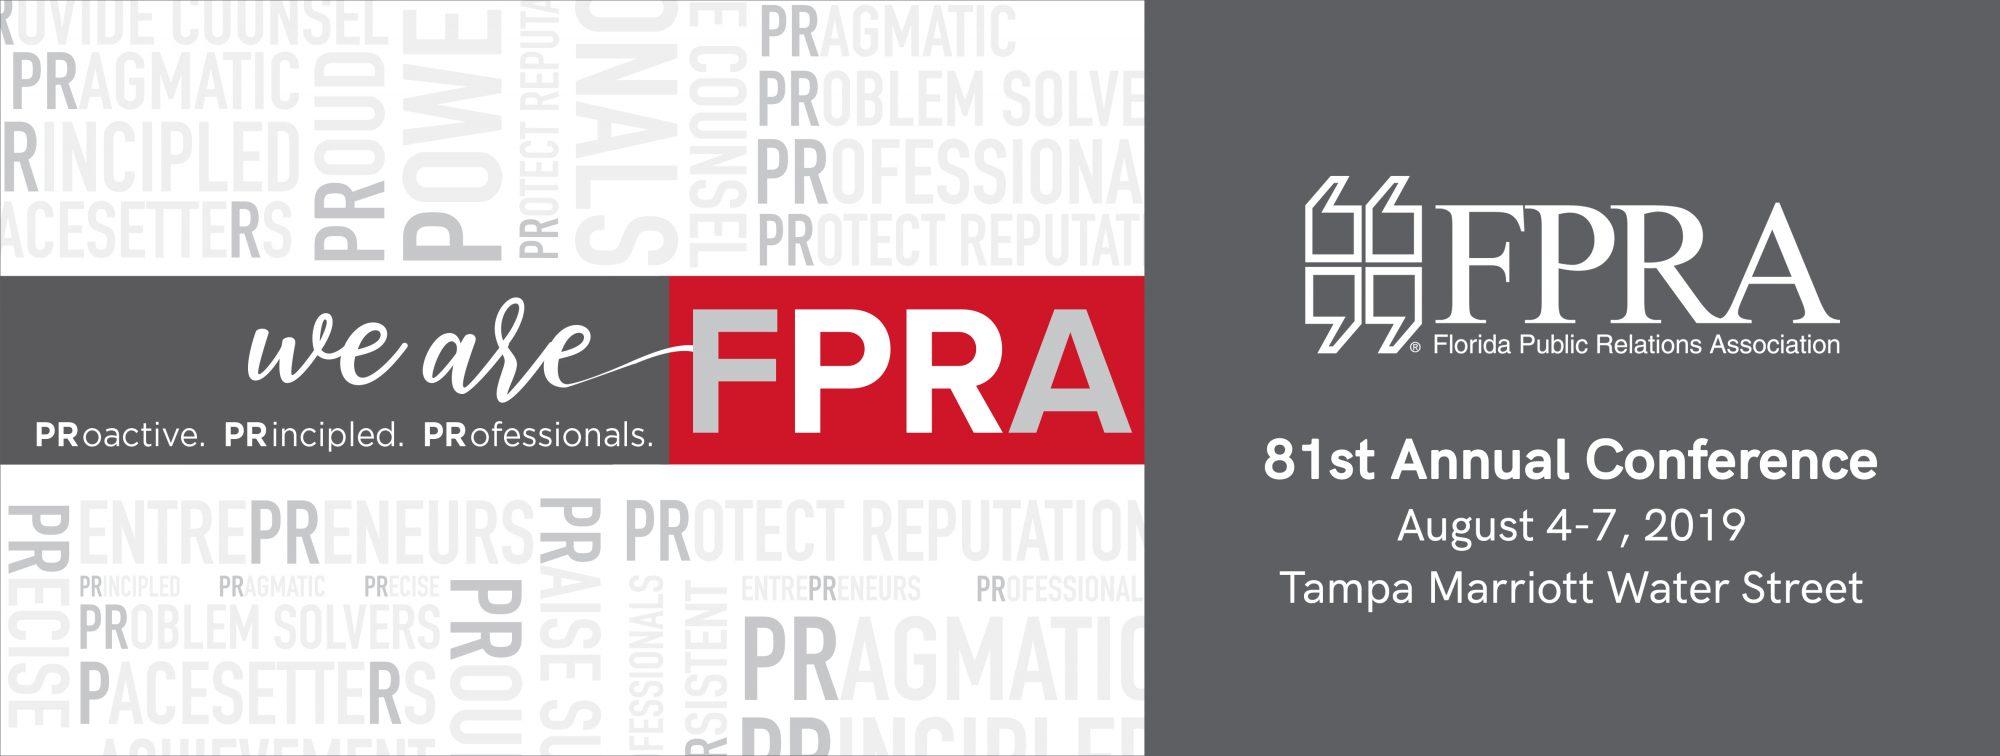 2019 Annual Conference - FPRA